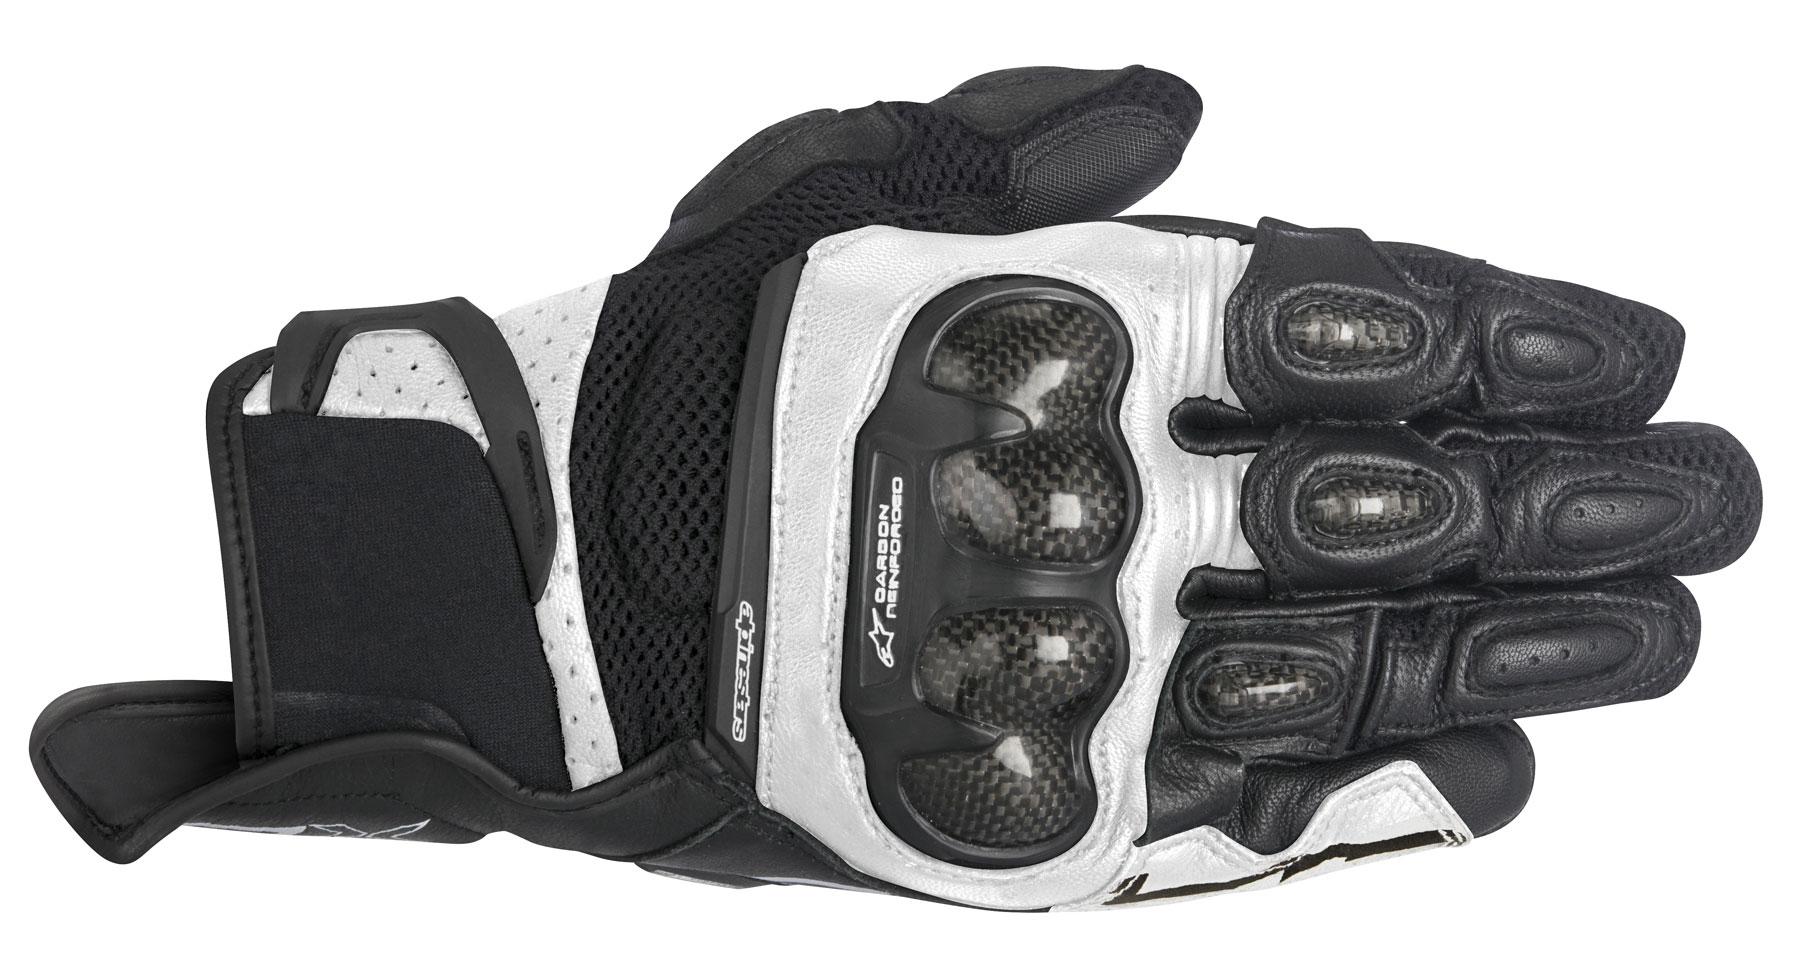 Alpinestars Stella SPX AIR CARBON Leather/Mesh Gloves (Black/White)